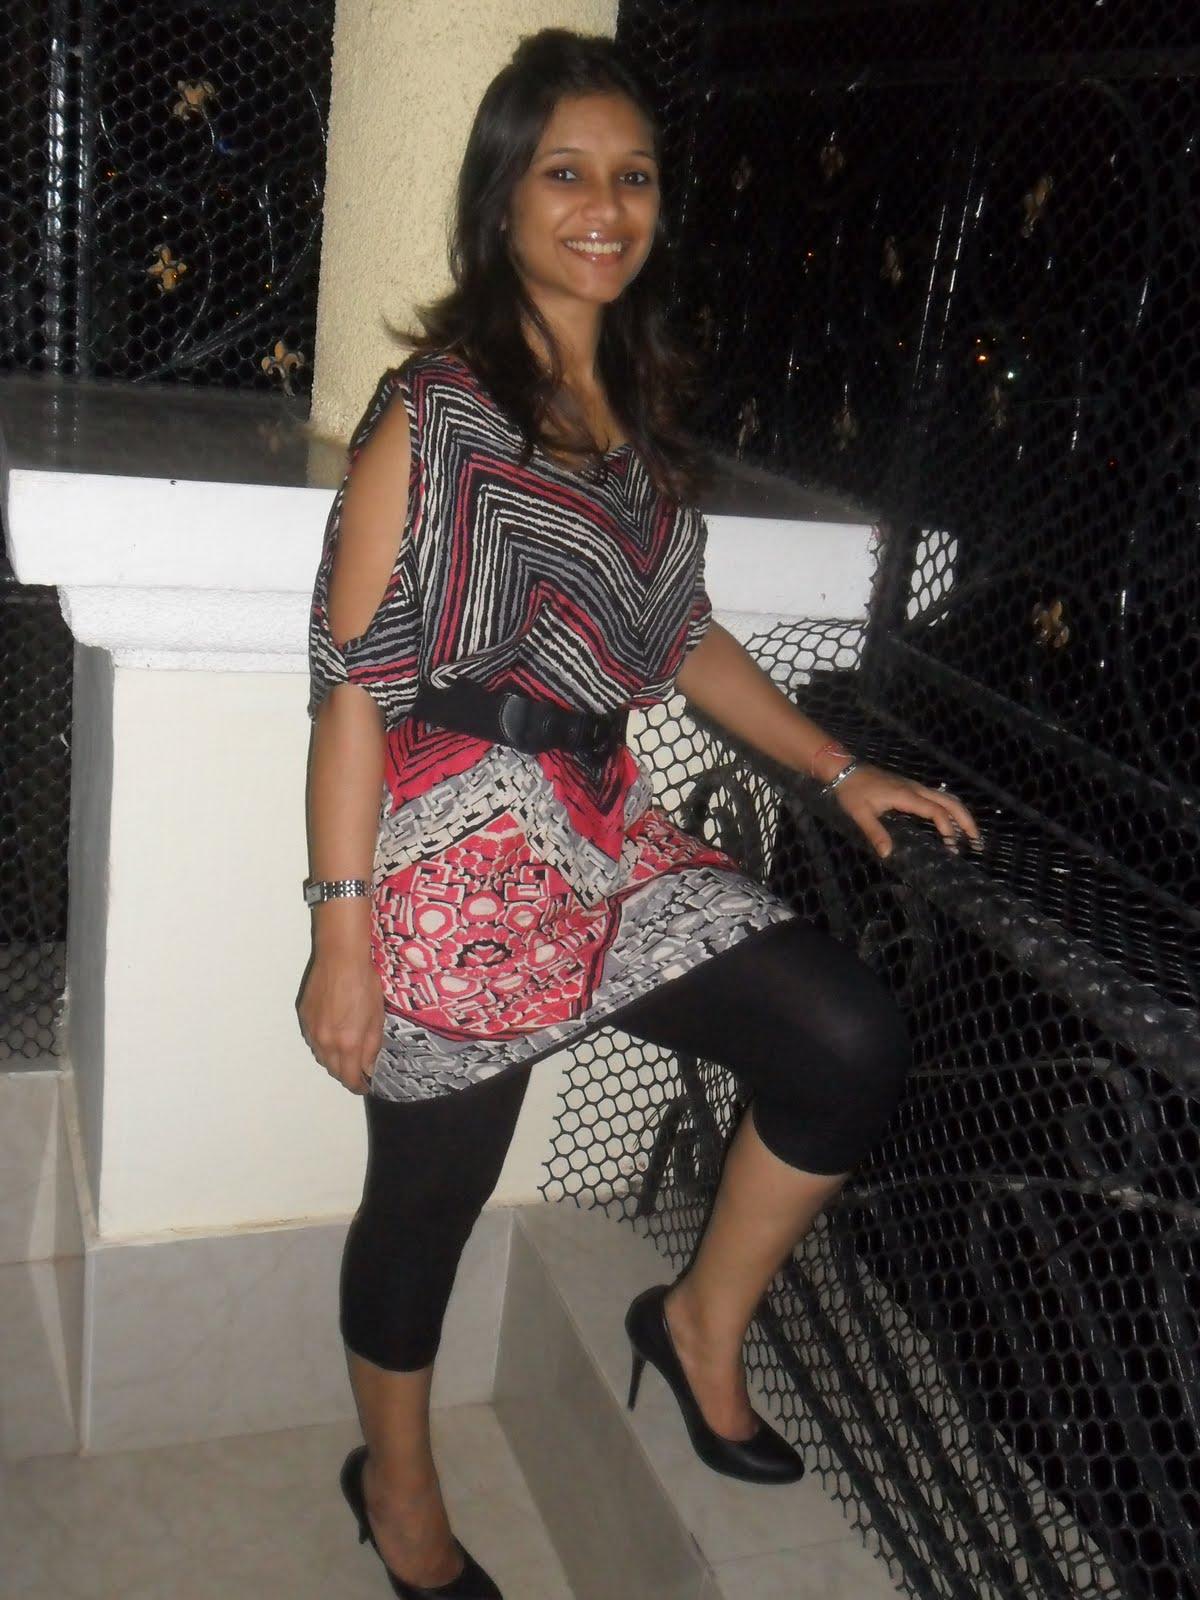 d214ebde34523 Ri(t)ch Styles   Indian Fashion